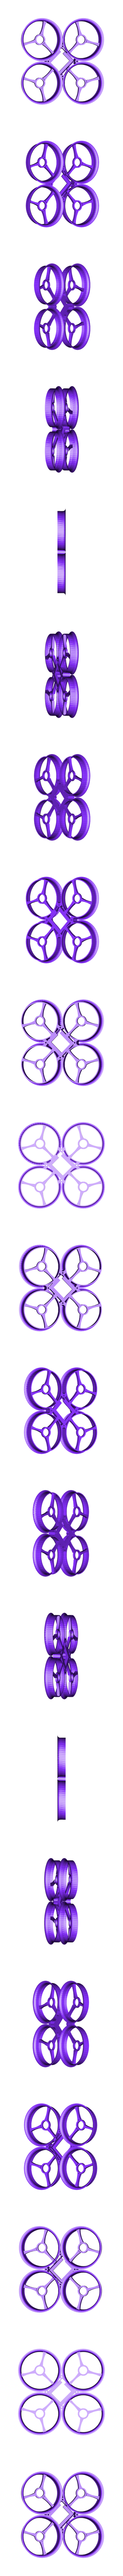 Tiny_whoop_68mm_polycarbonate.stl Download free STL file Tiny Whoop 68mm polycarbonate cross fashion • 3D printer design, Microdure